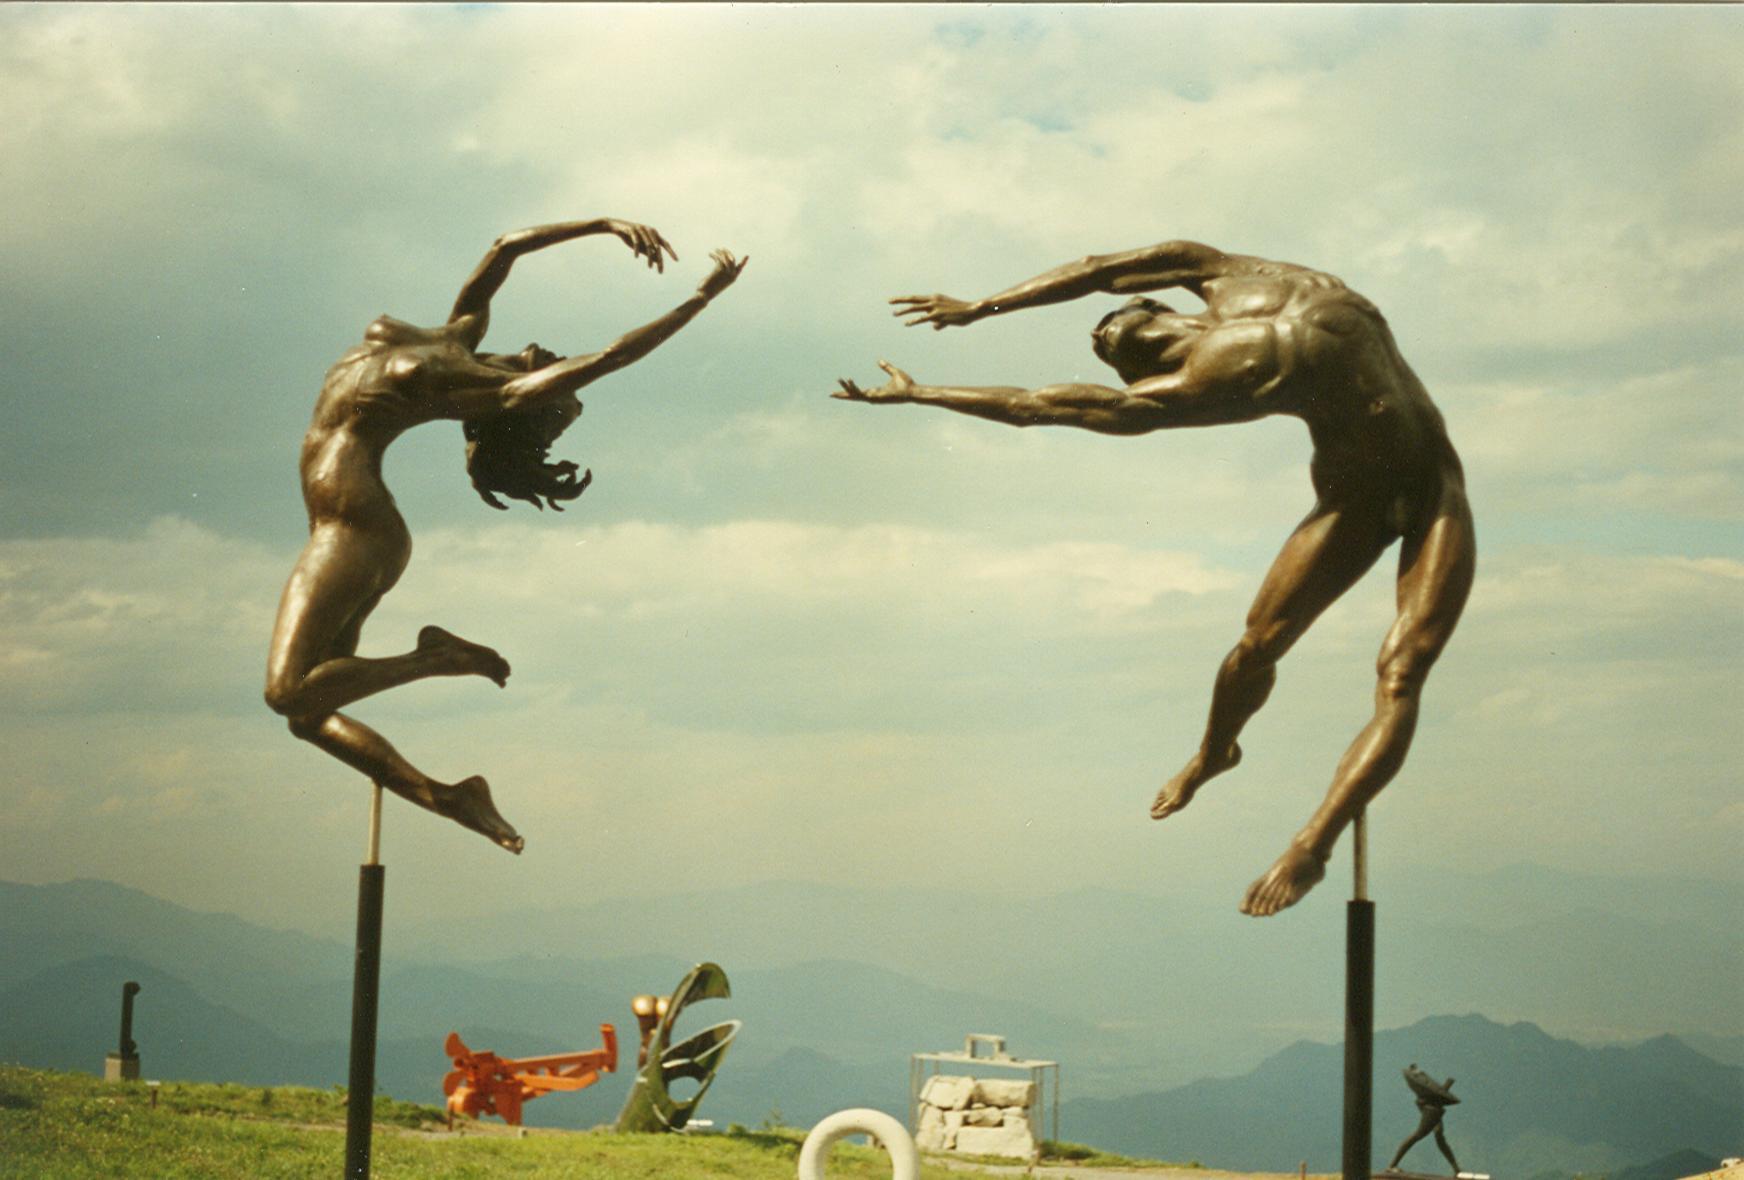 Reaching sculpture at Utsukushi-ga-hara Open Air Museum, Japan. Artist Zenos Frudakis.